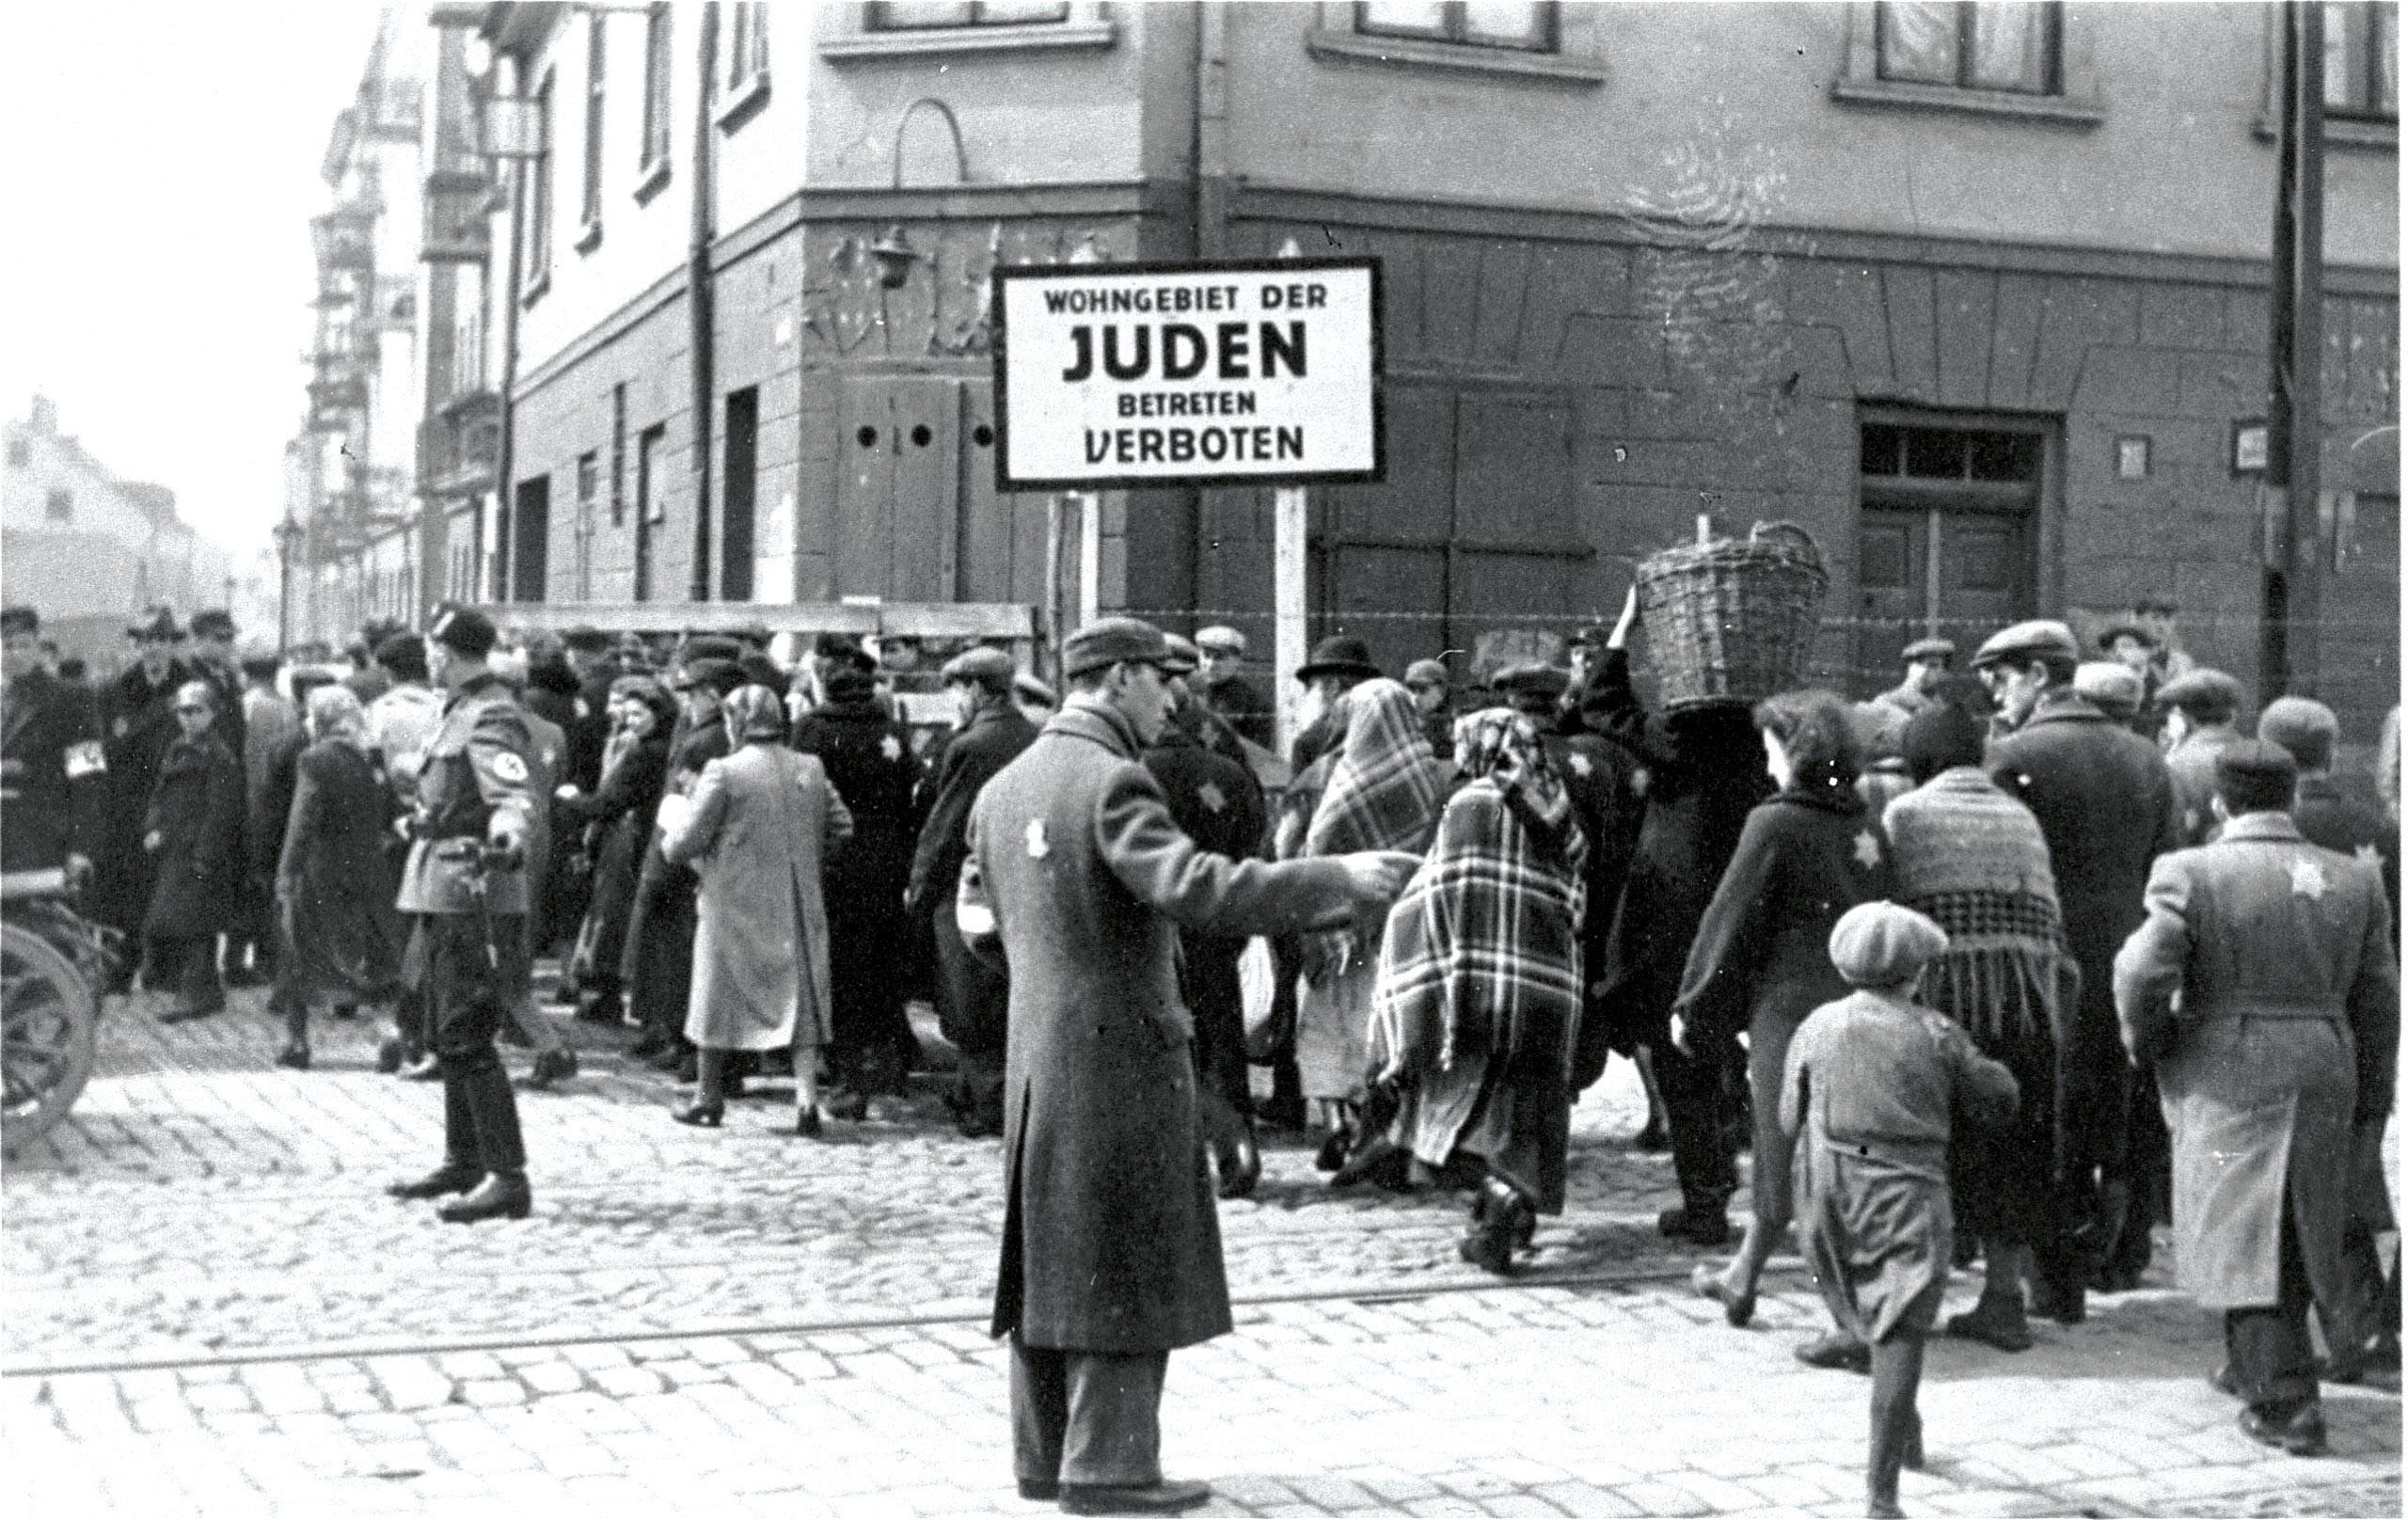 <stamp theme='his-green2'>Doc. 1</stamp> Le ghetto juif de Lodz en Pologne occupée (1940-1941)